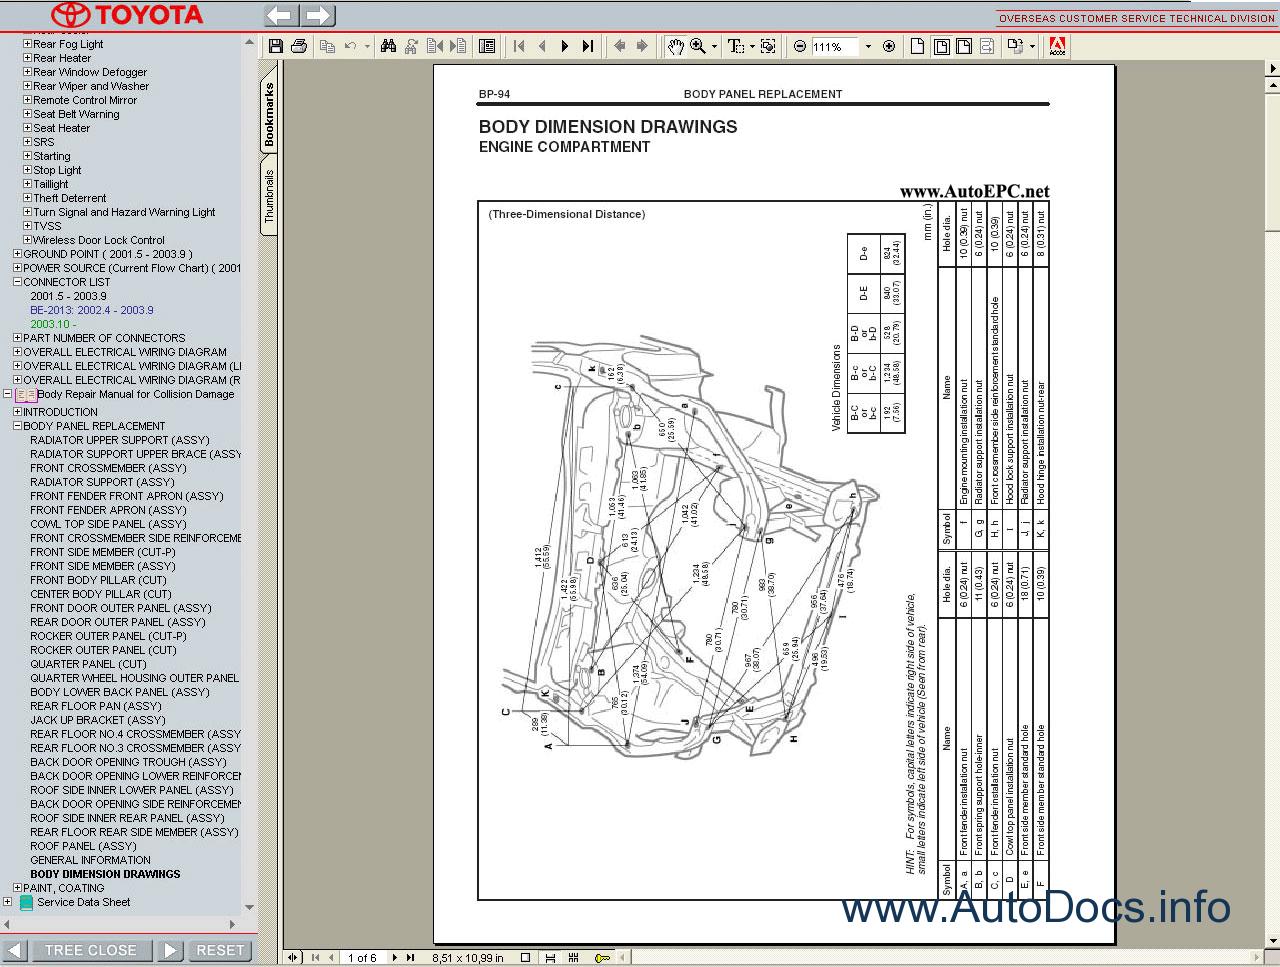 Electrical Wiring Diagram Toyota Avensis : Electrical wiring diagrams toyota avensis repair manual